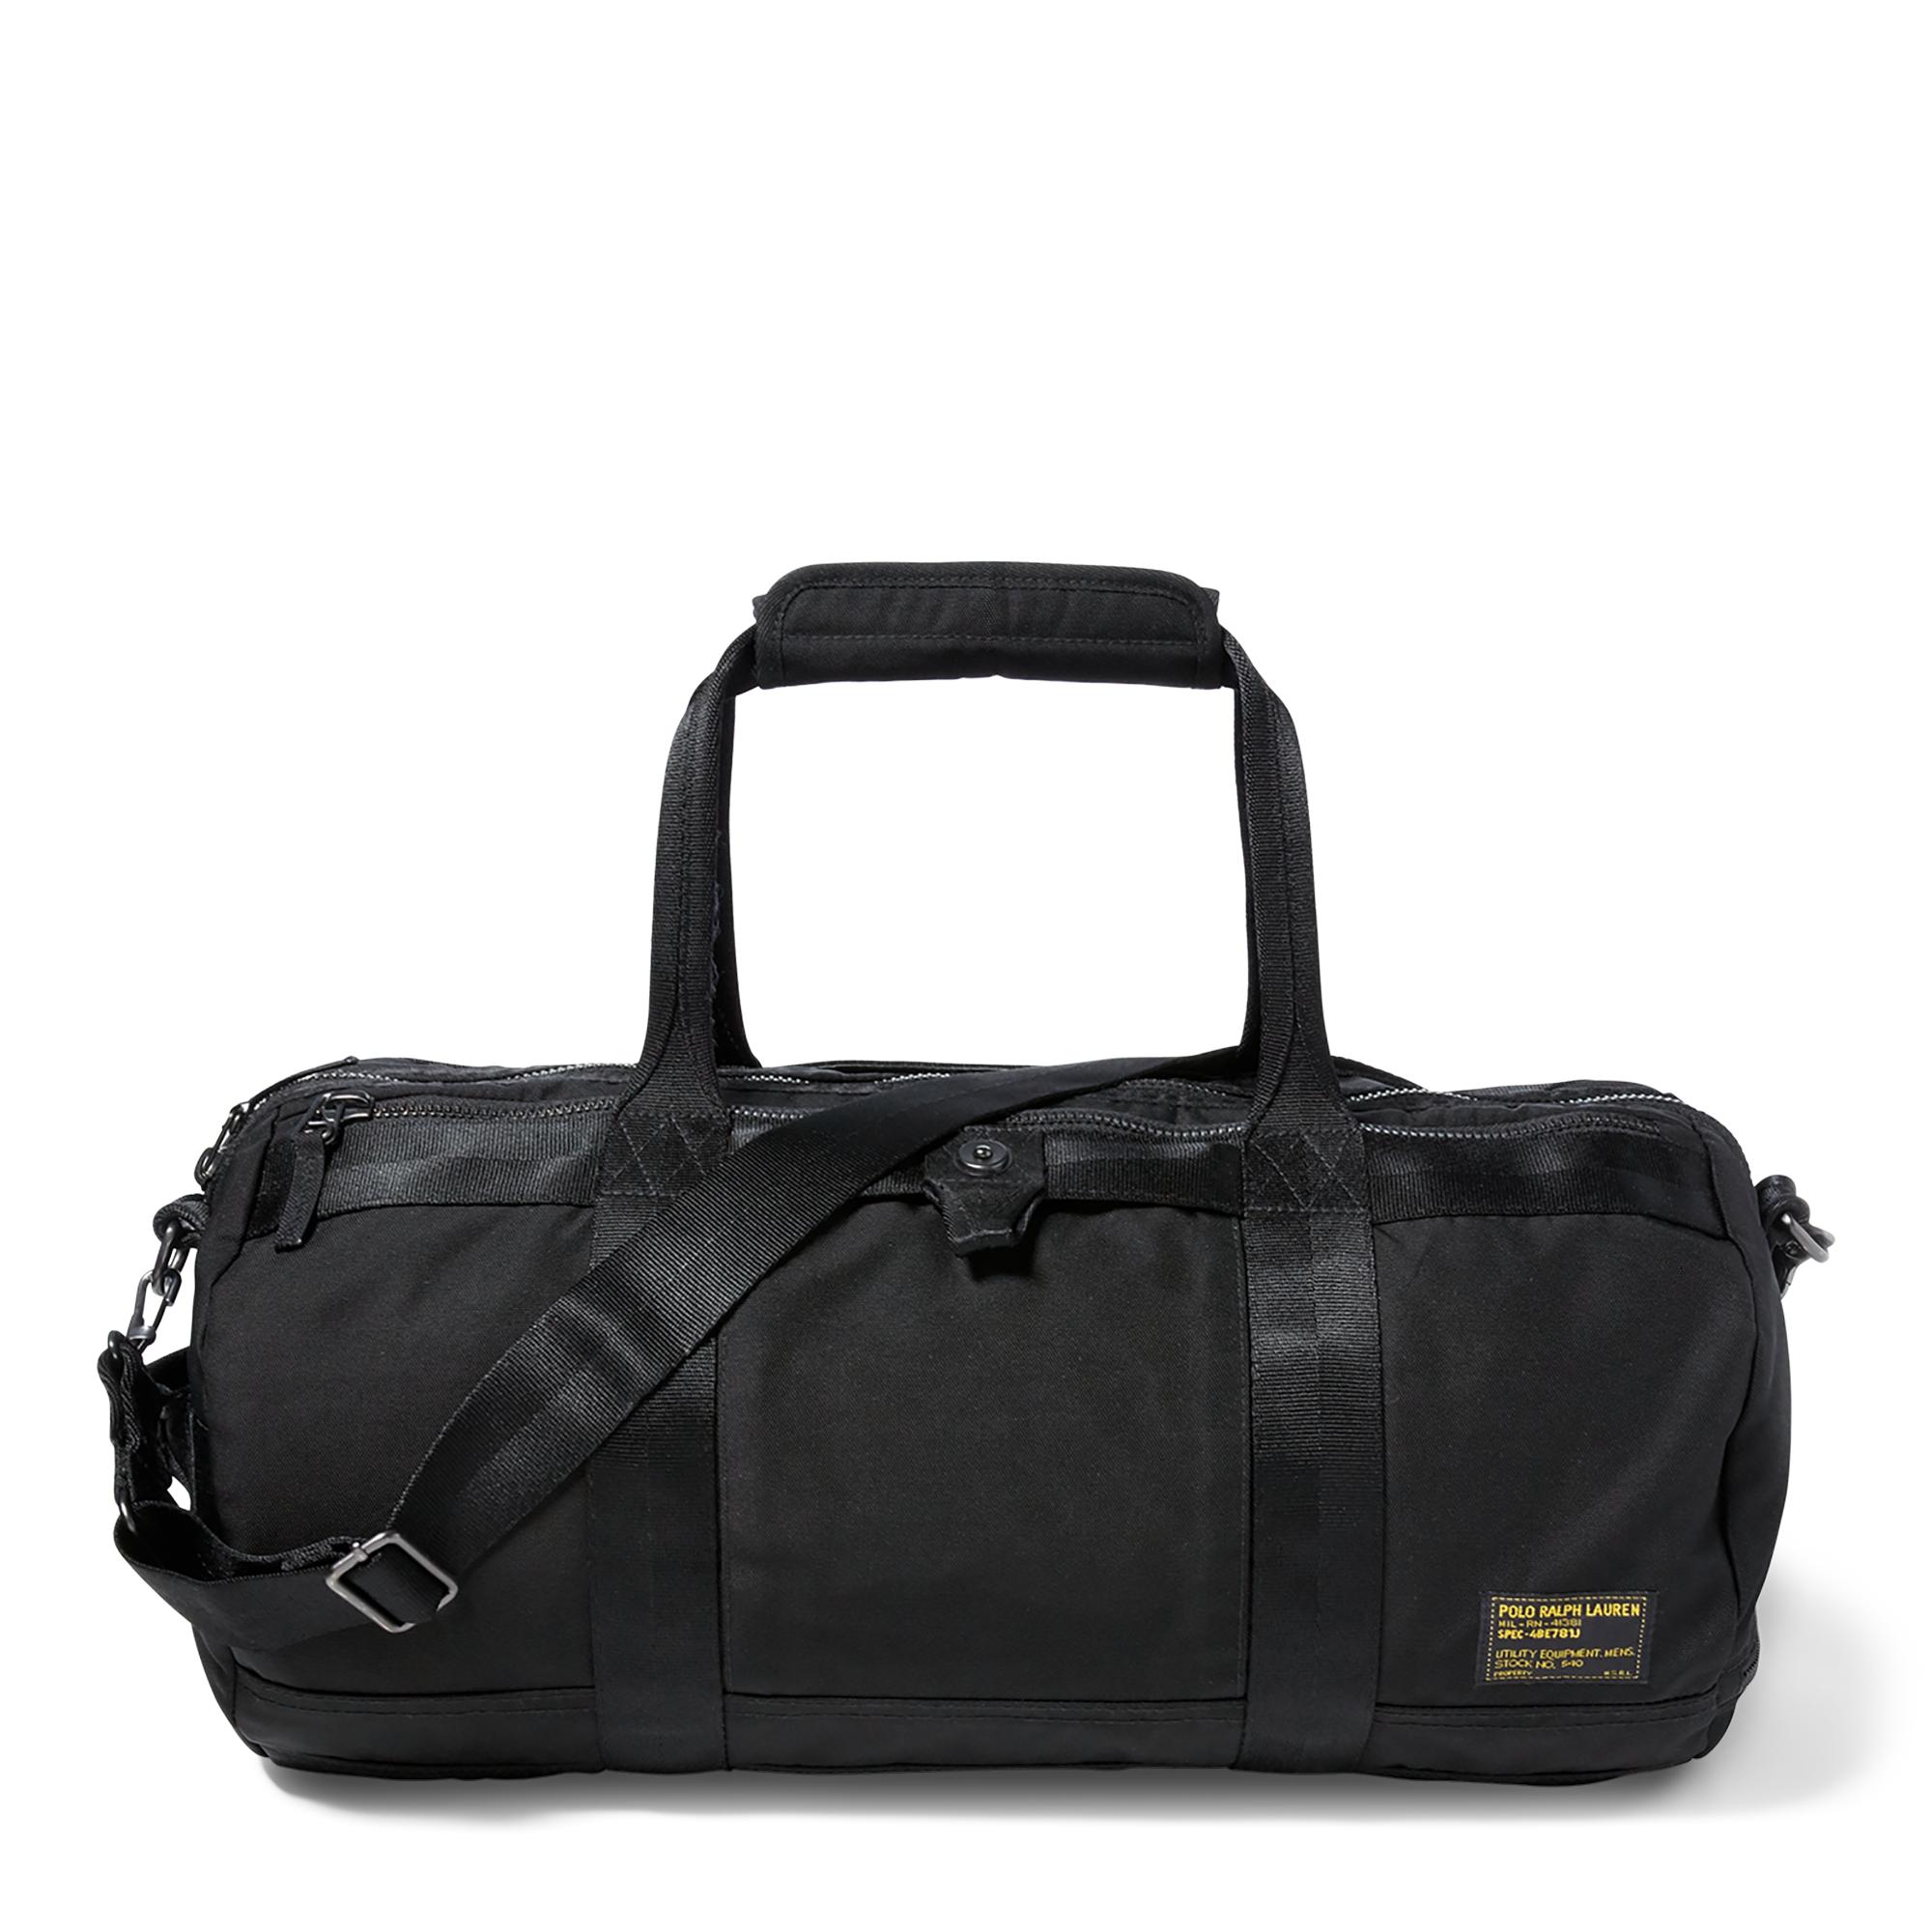 322eb5f4a3e2 Ralph Lauren Duffle Bag Free Gift